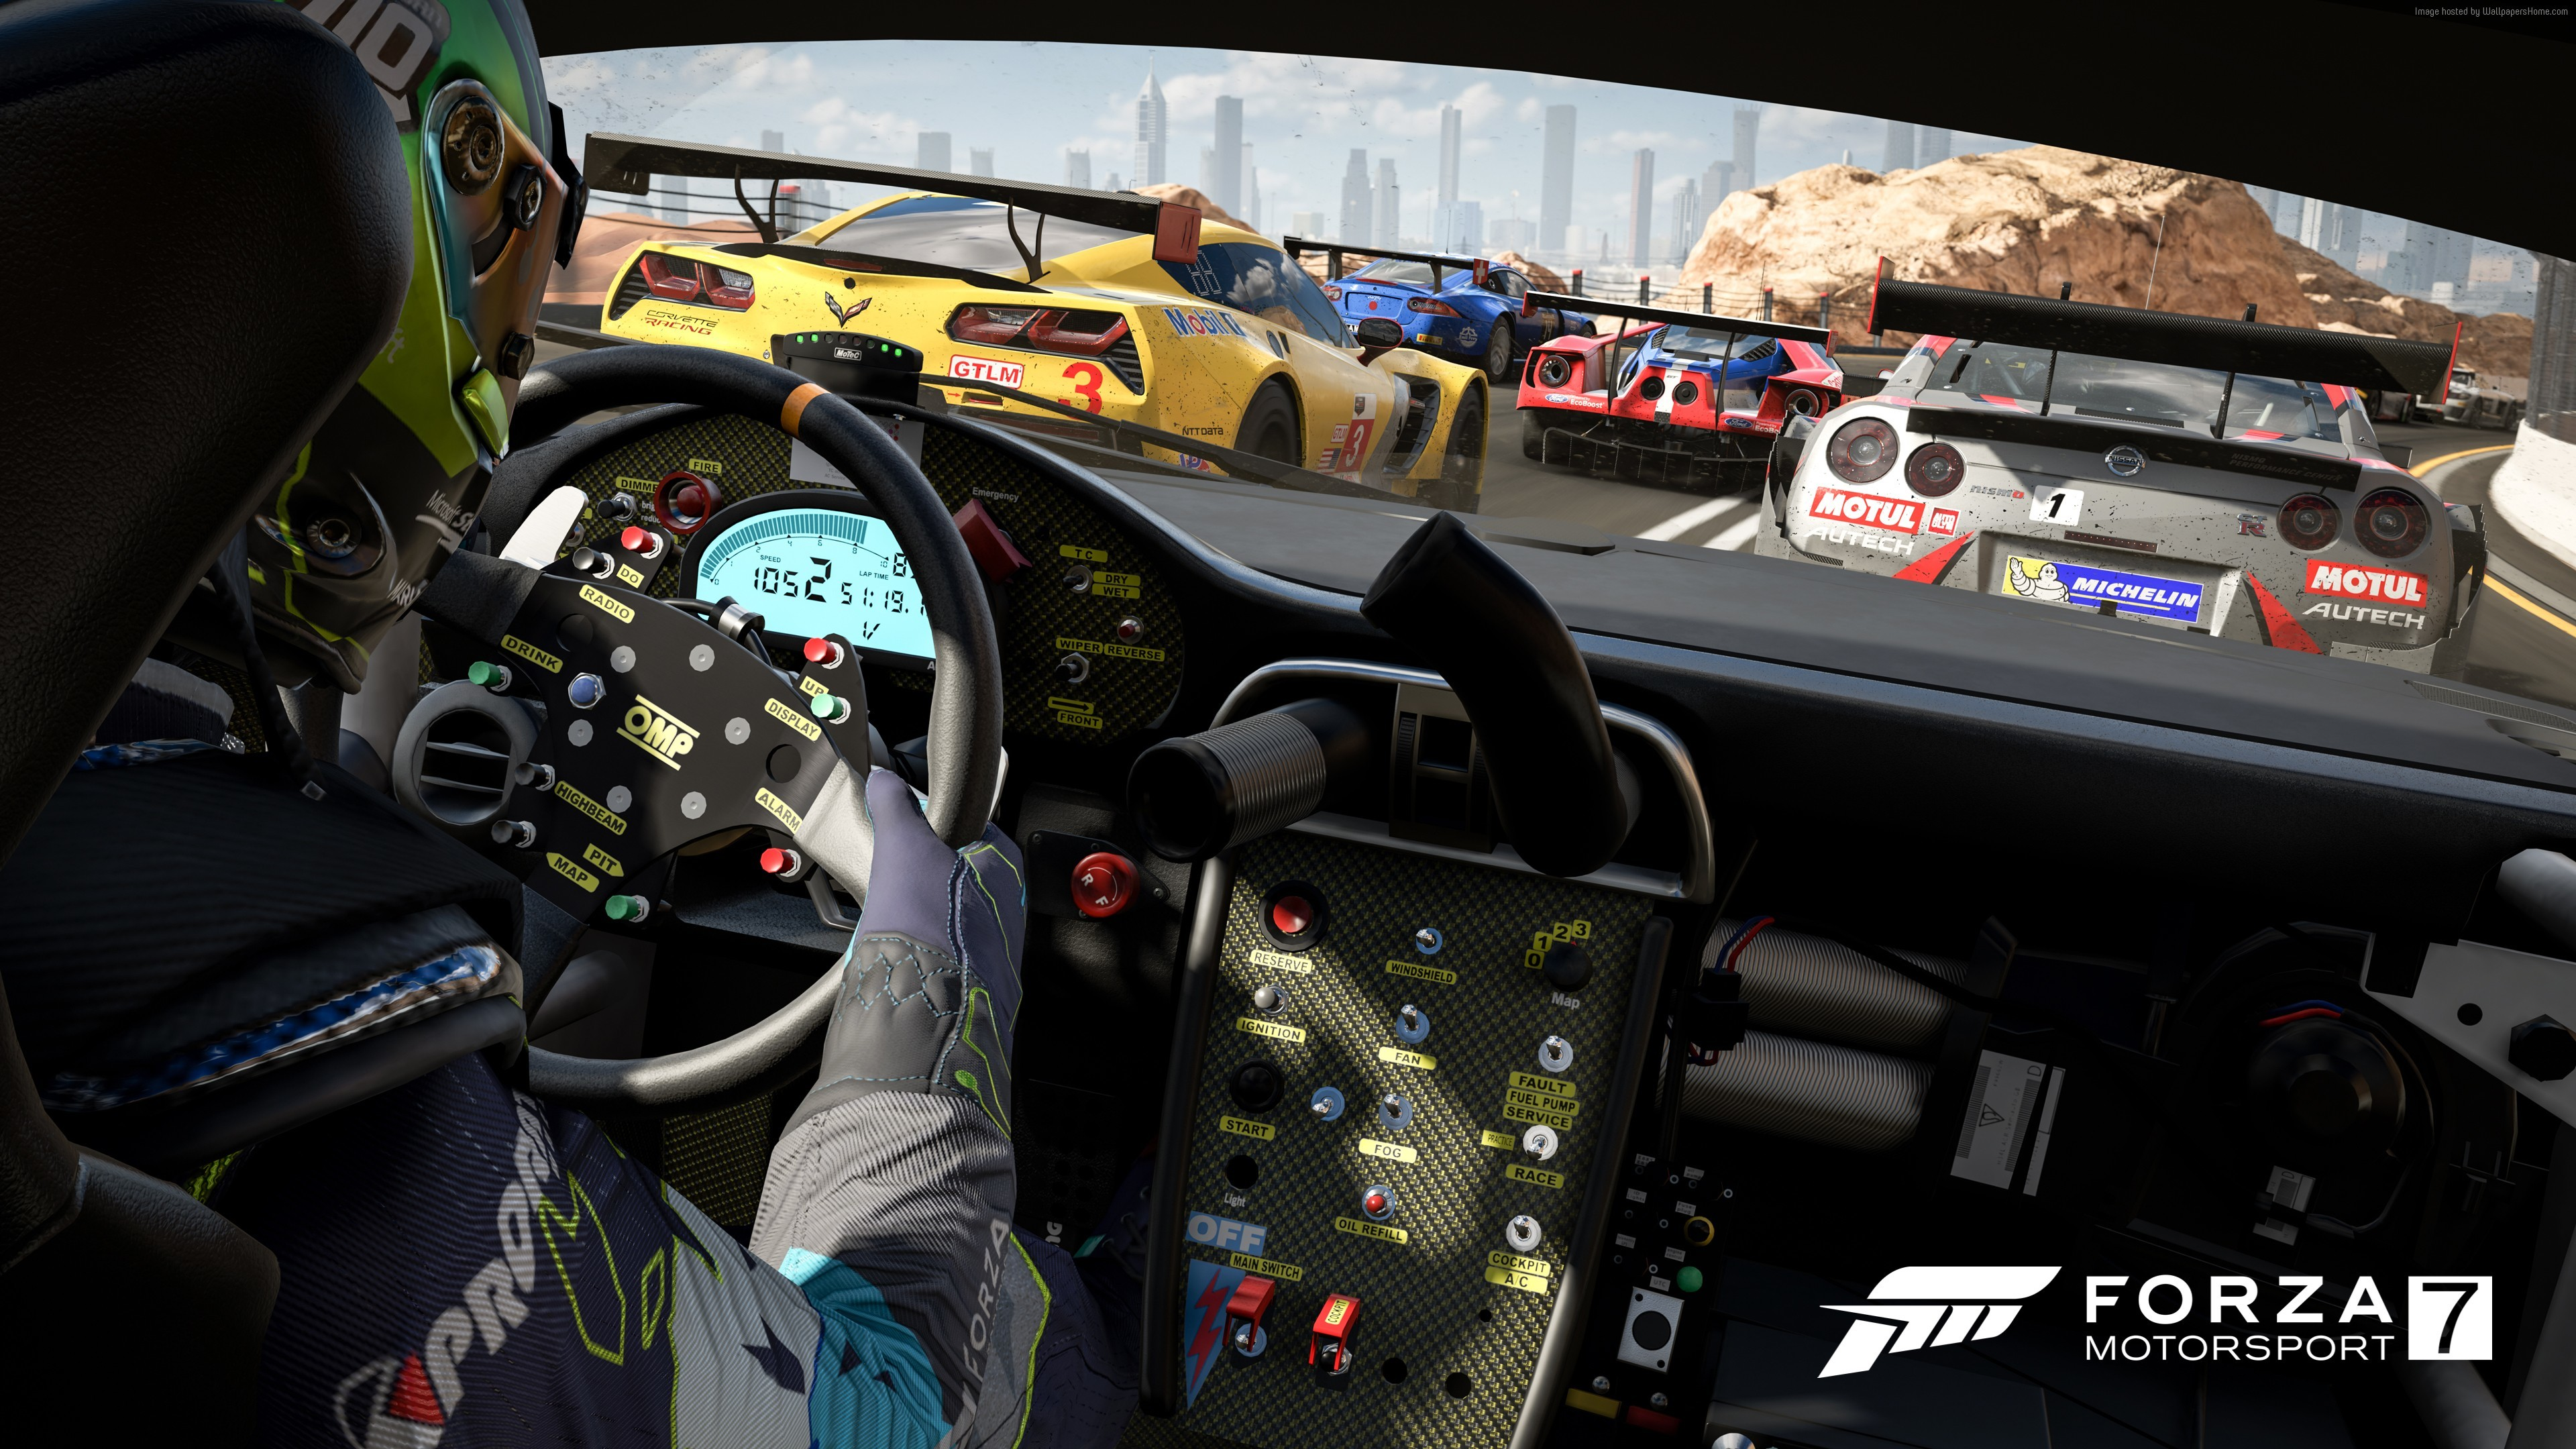 Forza Motorsport 7, 4k, E3 2017, Xbox One X (horizontal) …